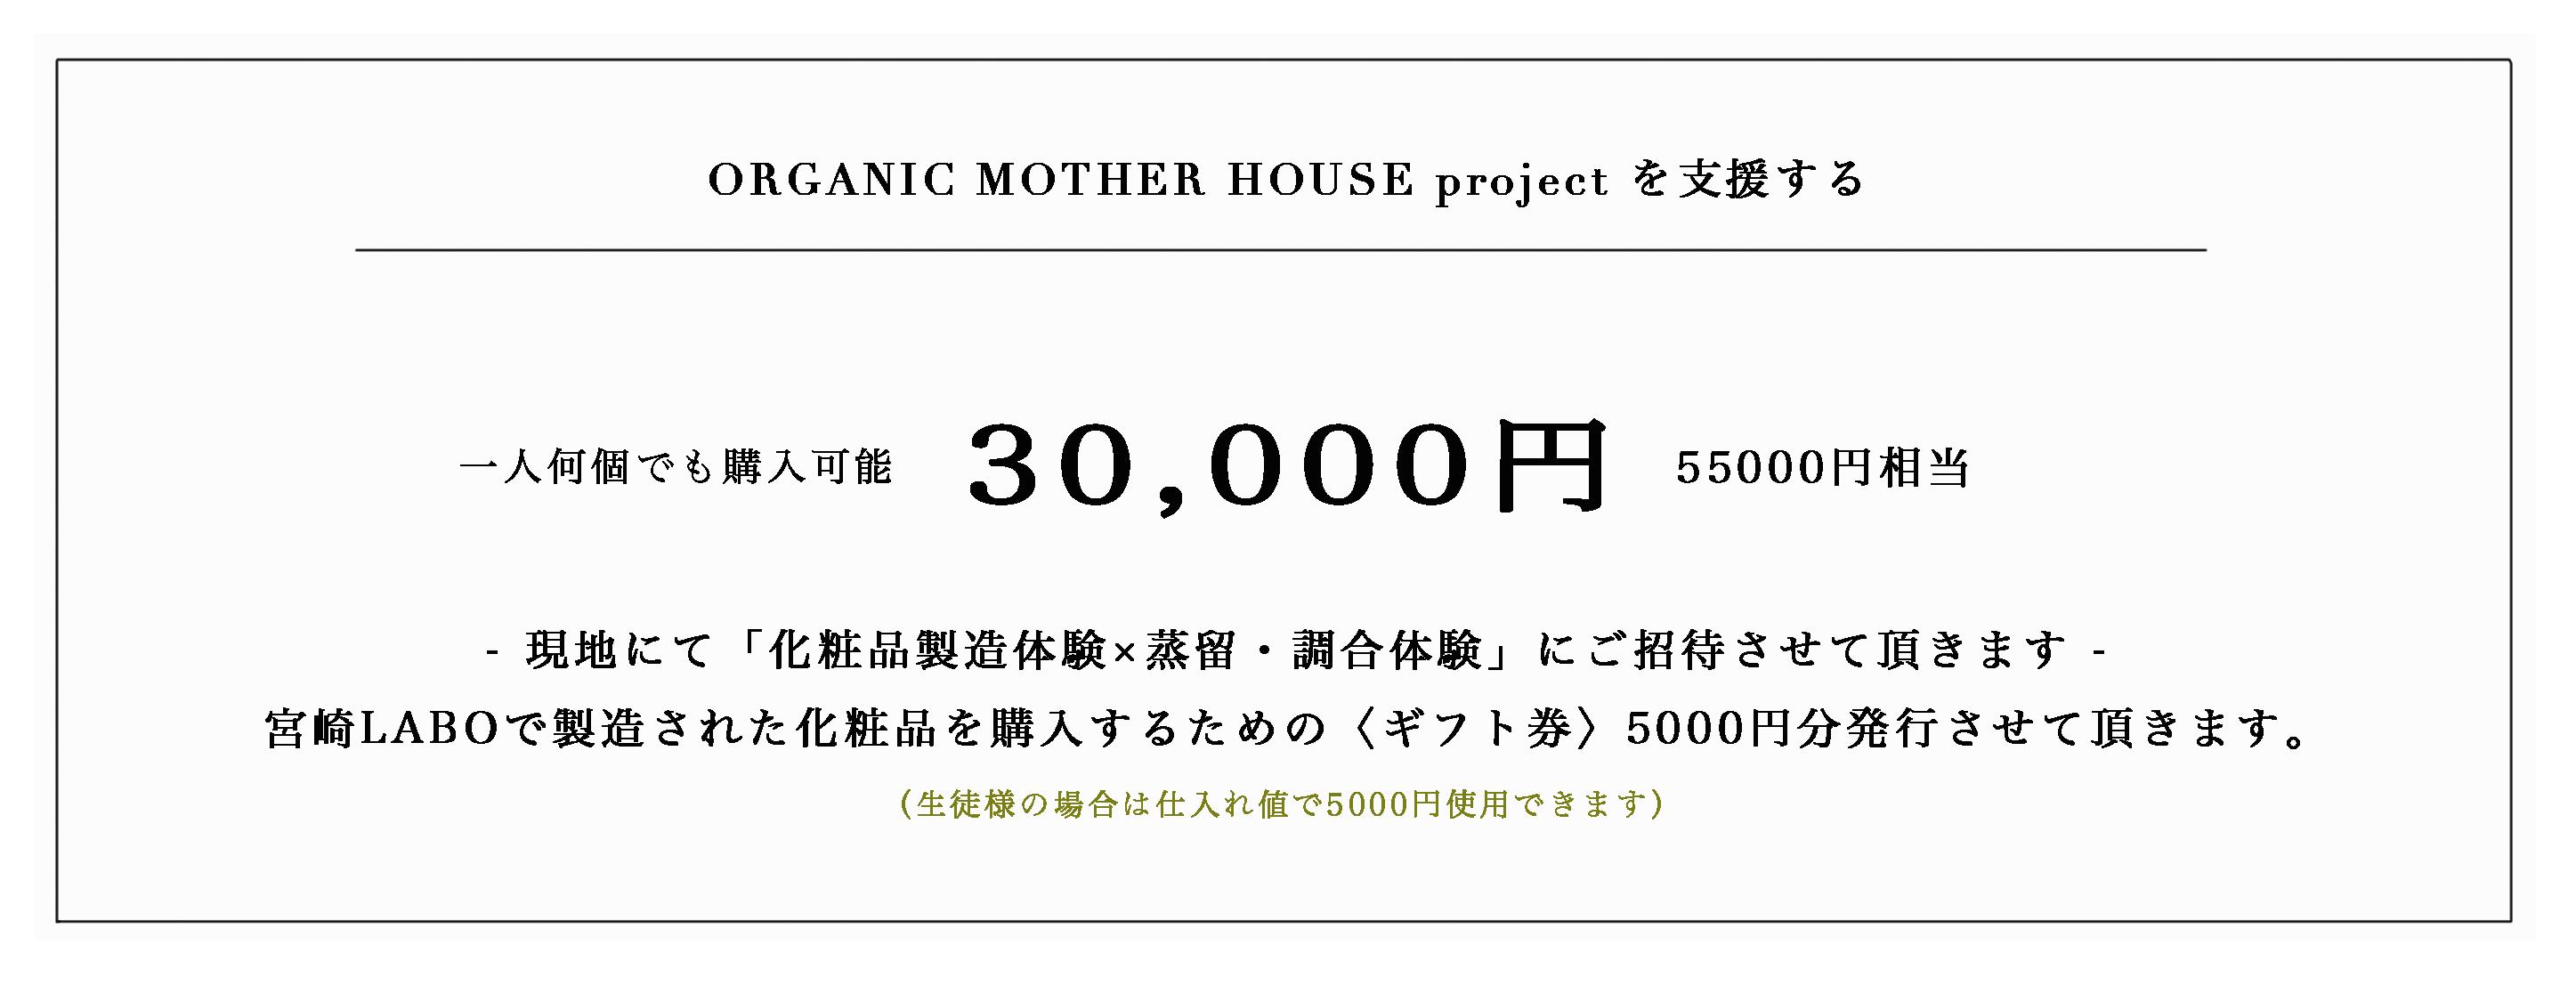 ORGANIC MOTHER HOUSE〈植物調合美容研究所〉3万2